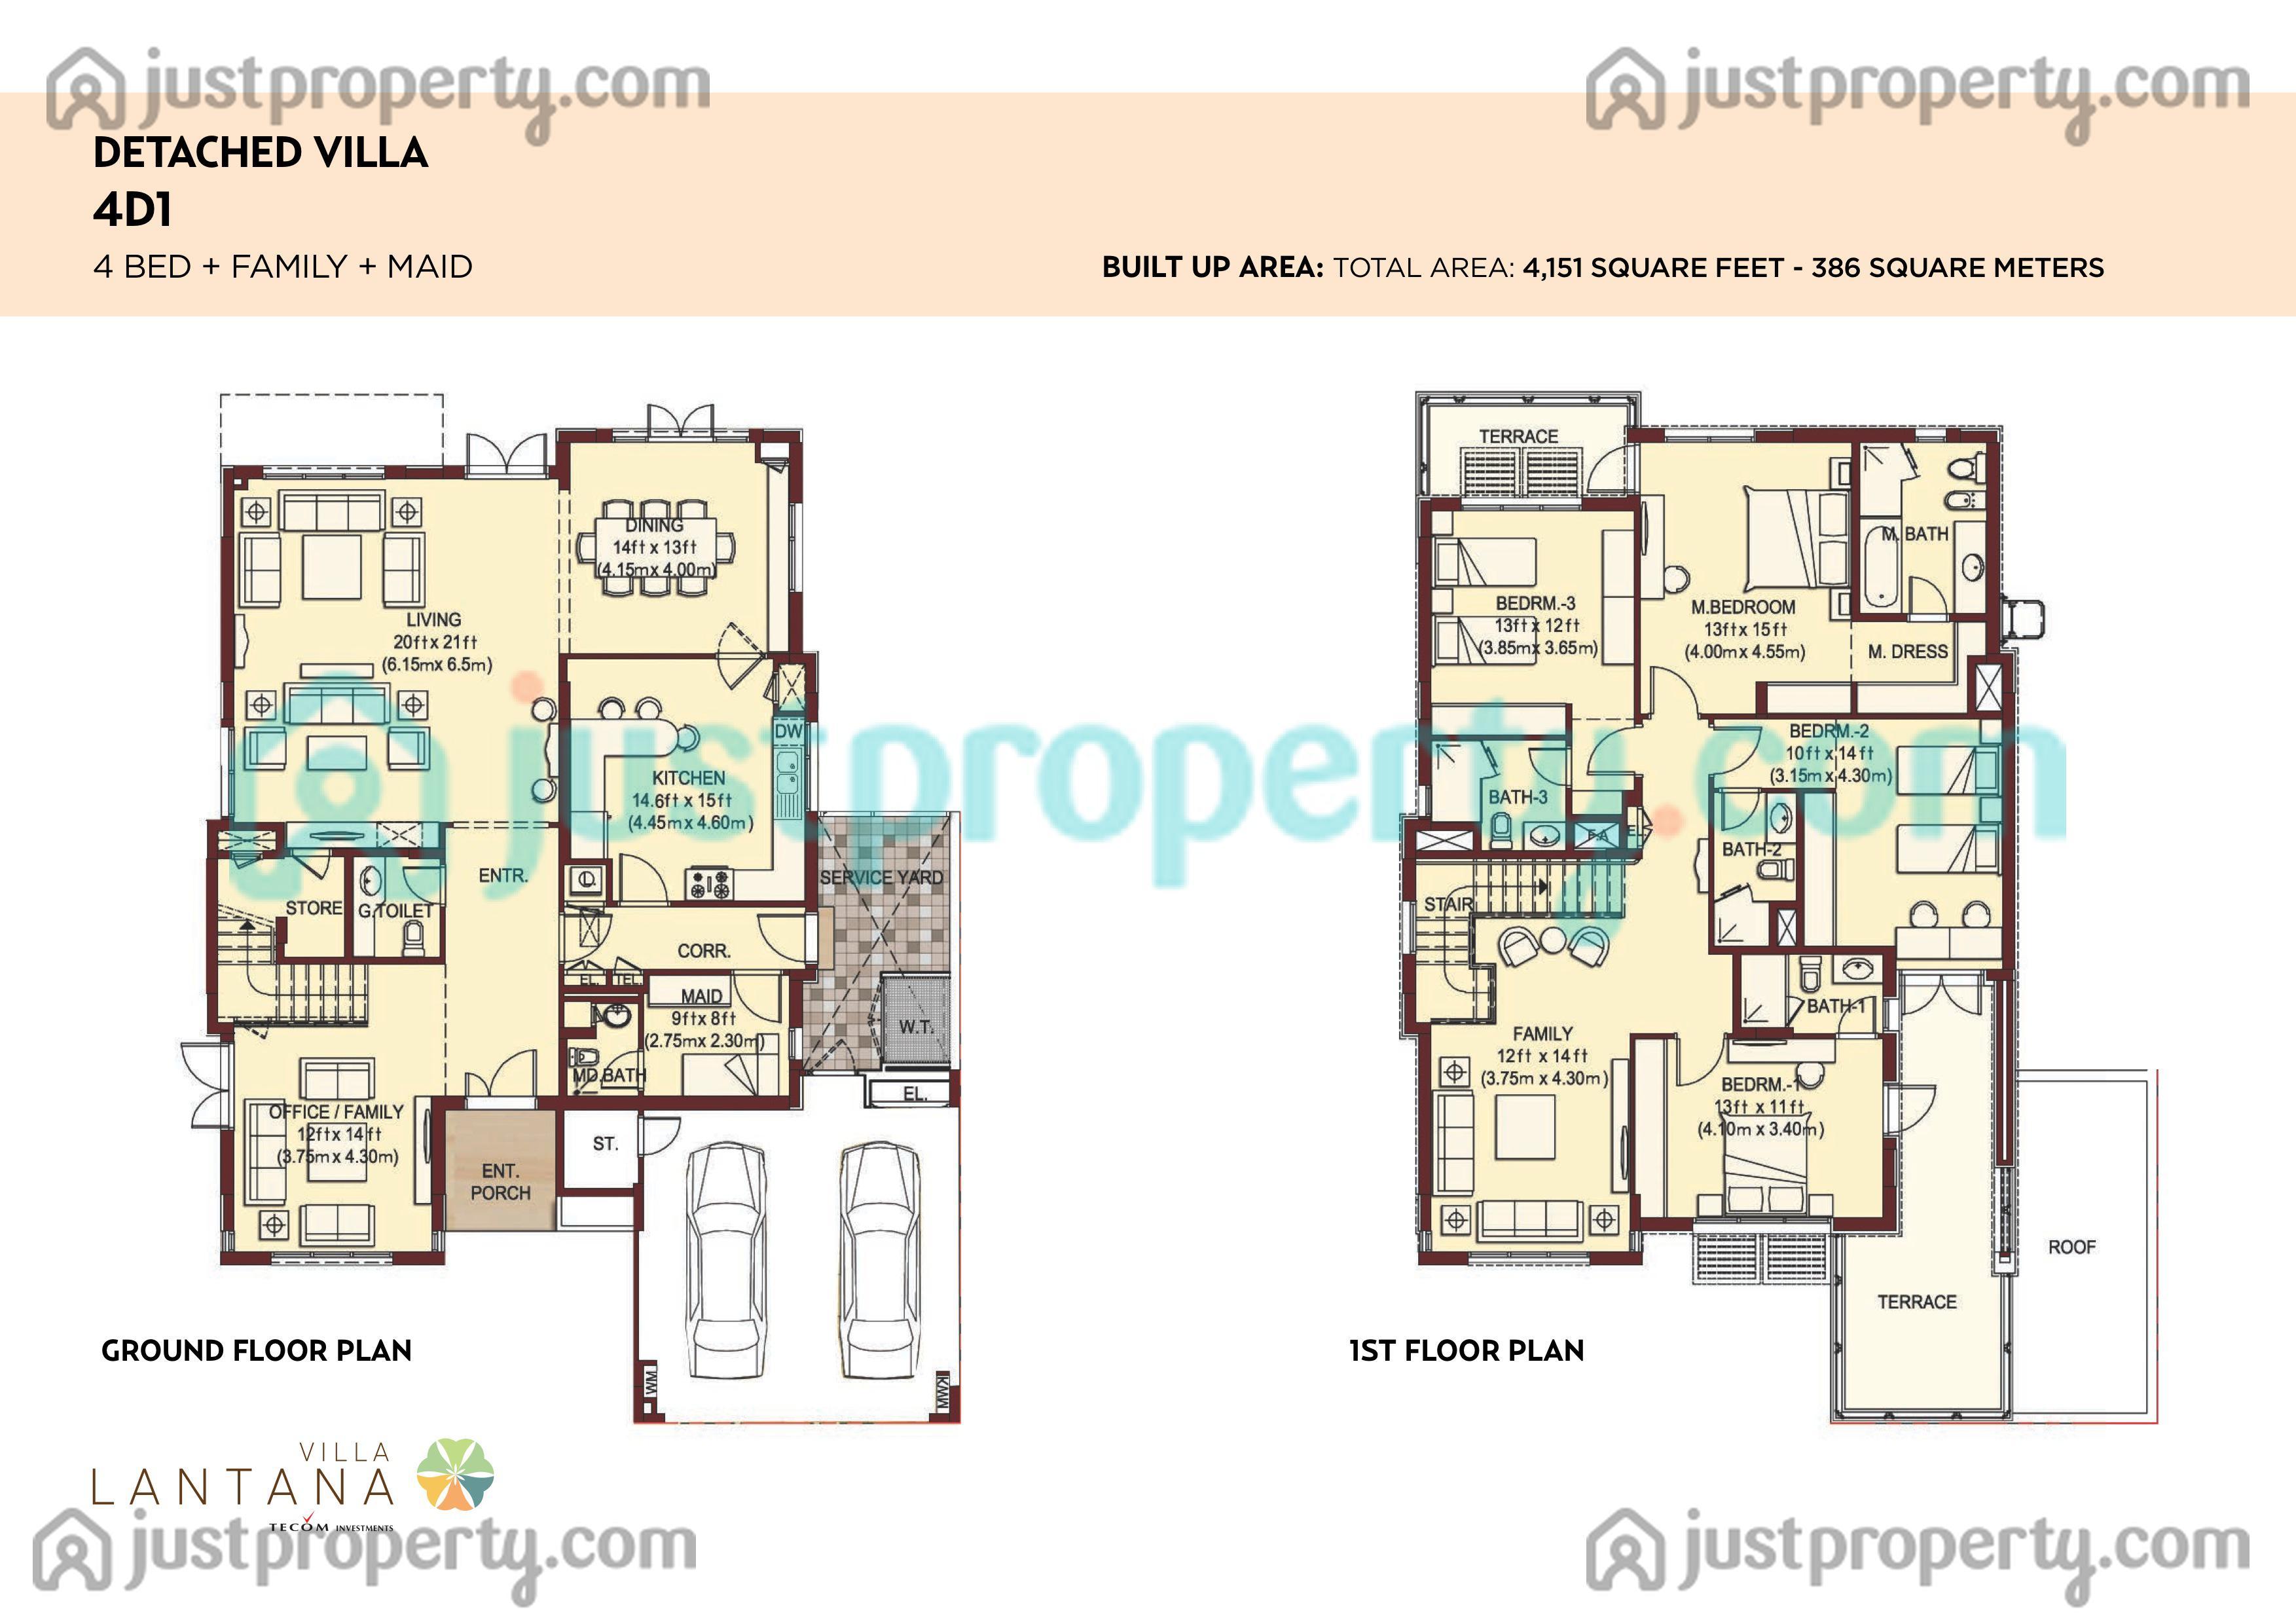 lantana villas floor plans justproperty com lantana villas floor plans justproperty com